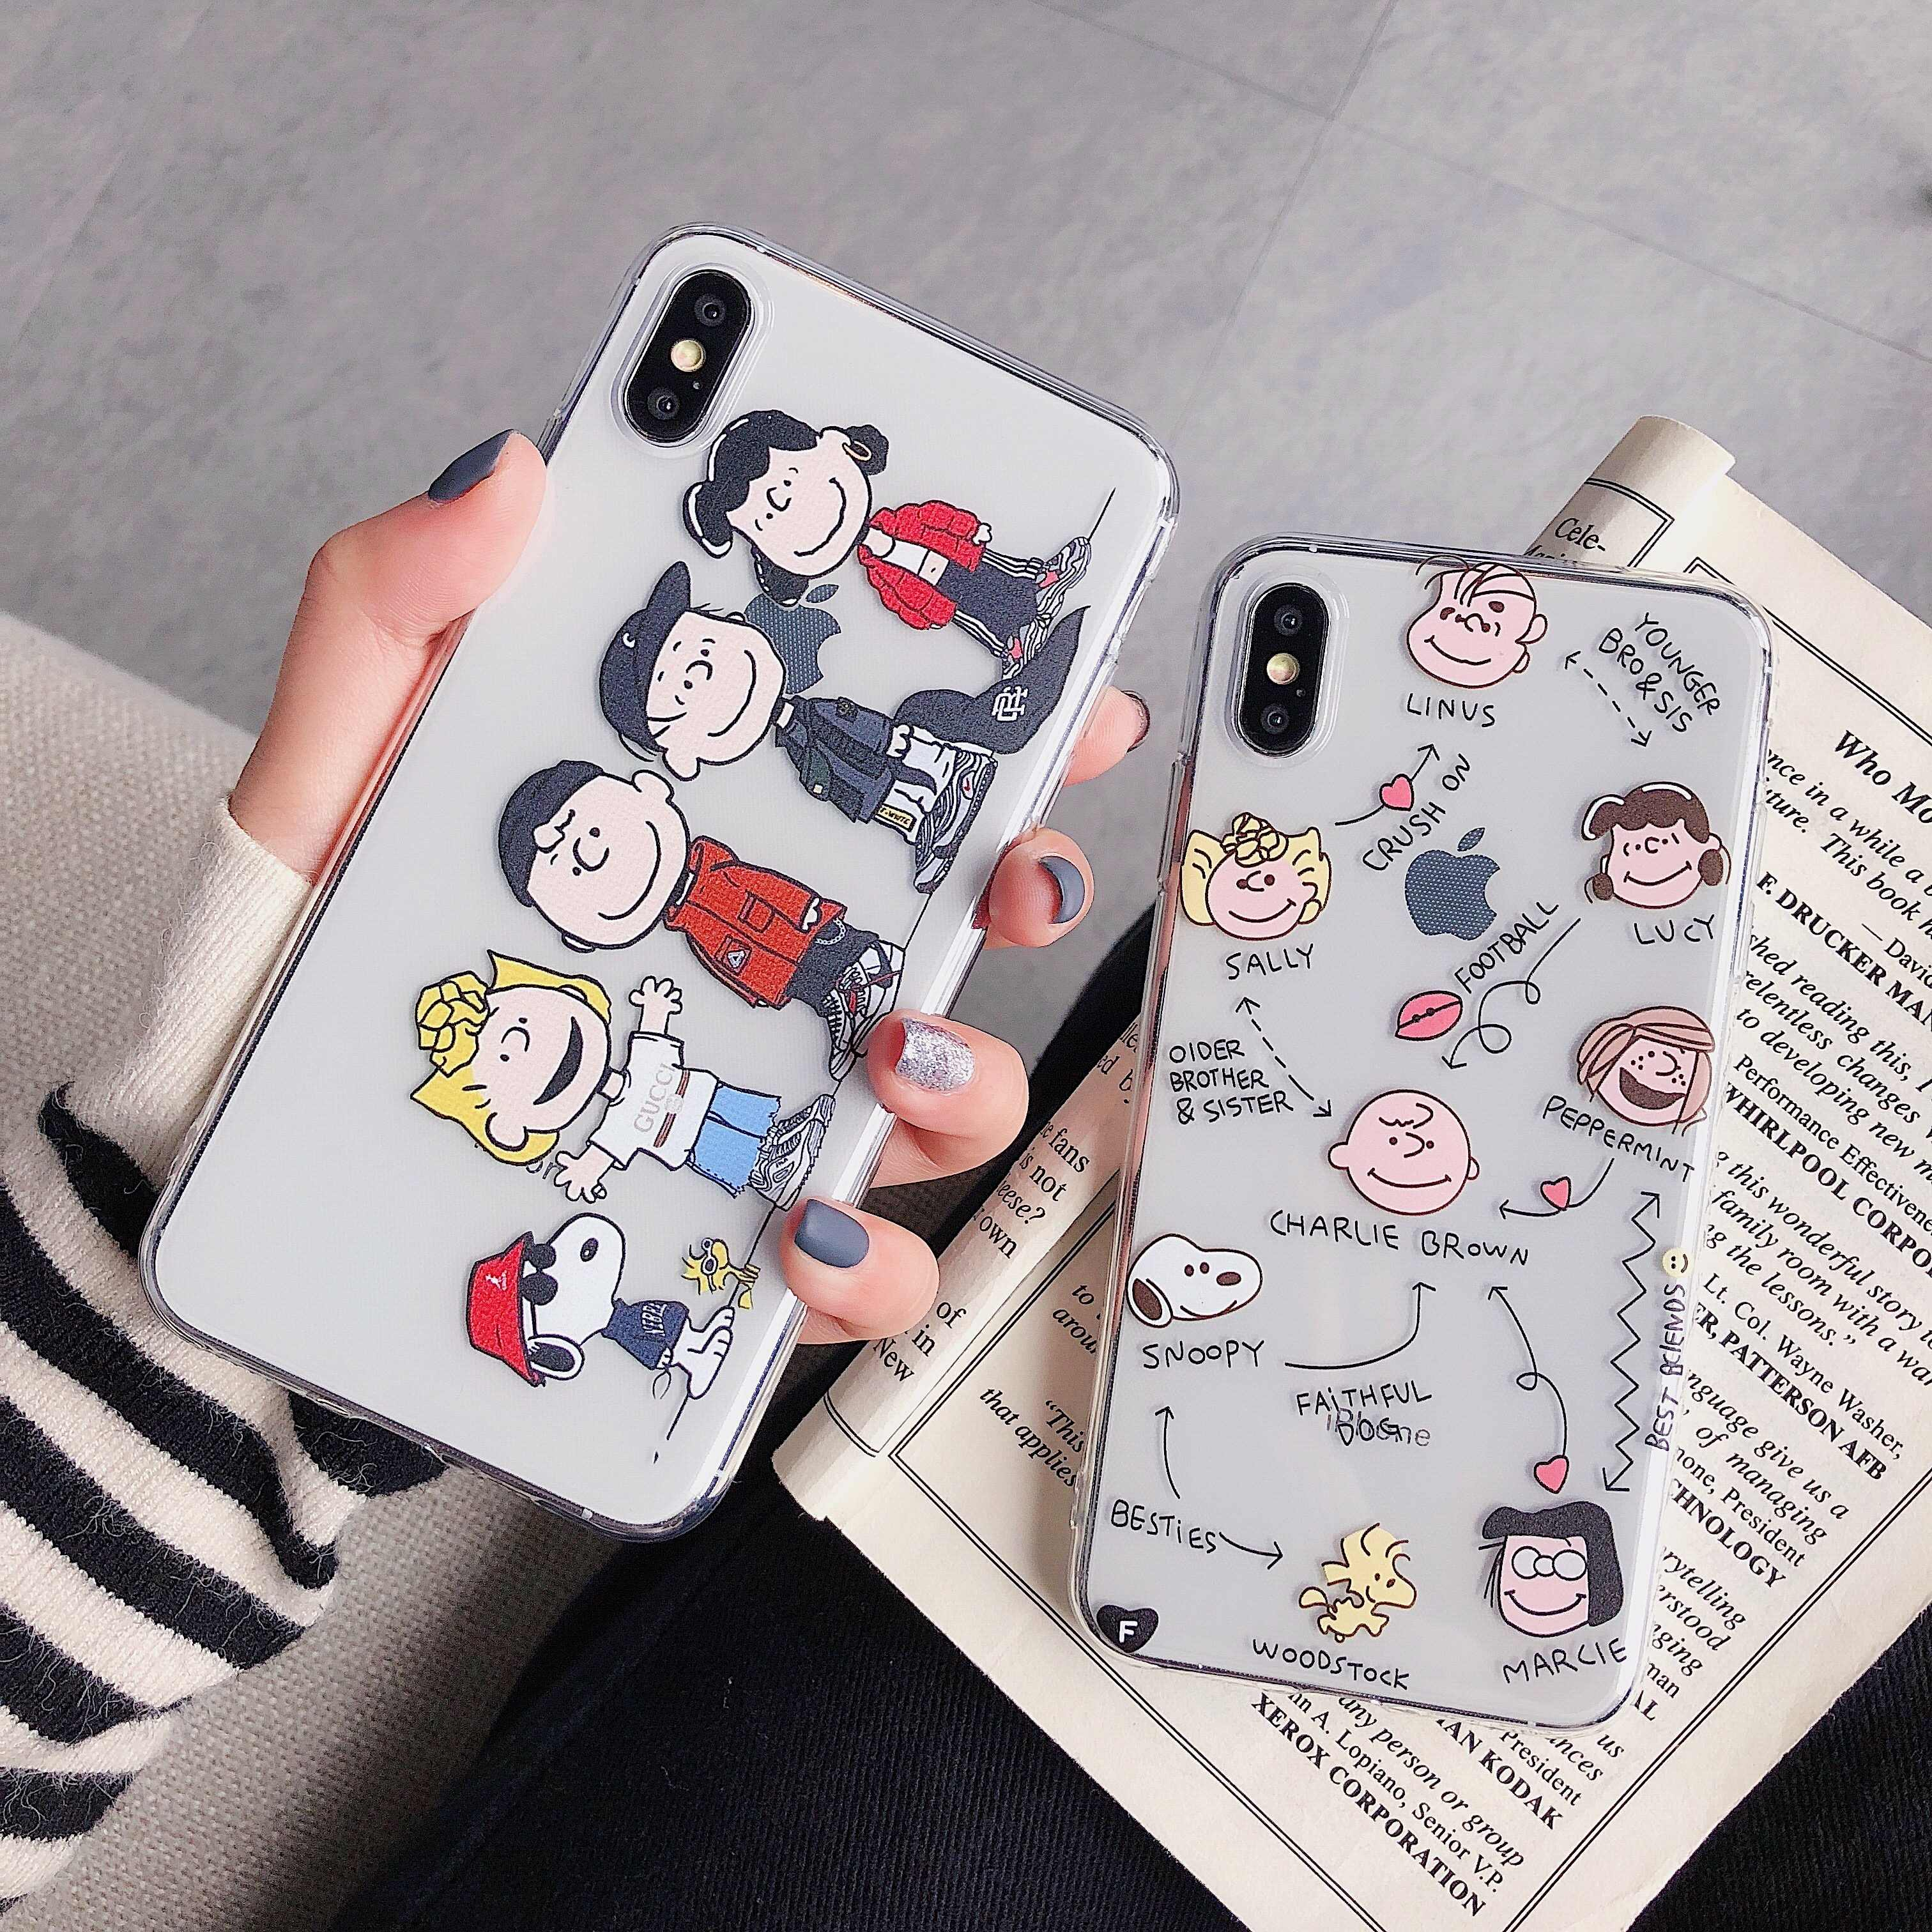 Transparan Baru Ultra Tipis Kartun Case untuk iPhone 11 Pro 6 S 6 S Plus X XR X MAX 8 8 Plus 7 Telepon Kasus Jelas Kasus Promax Case